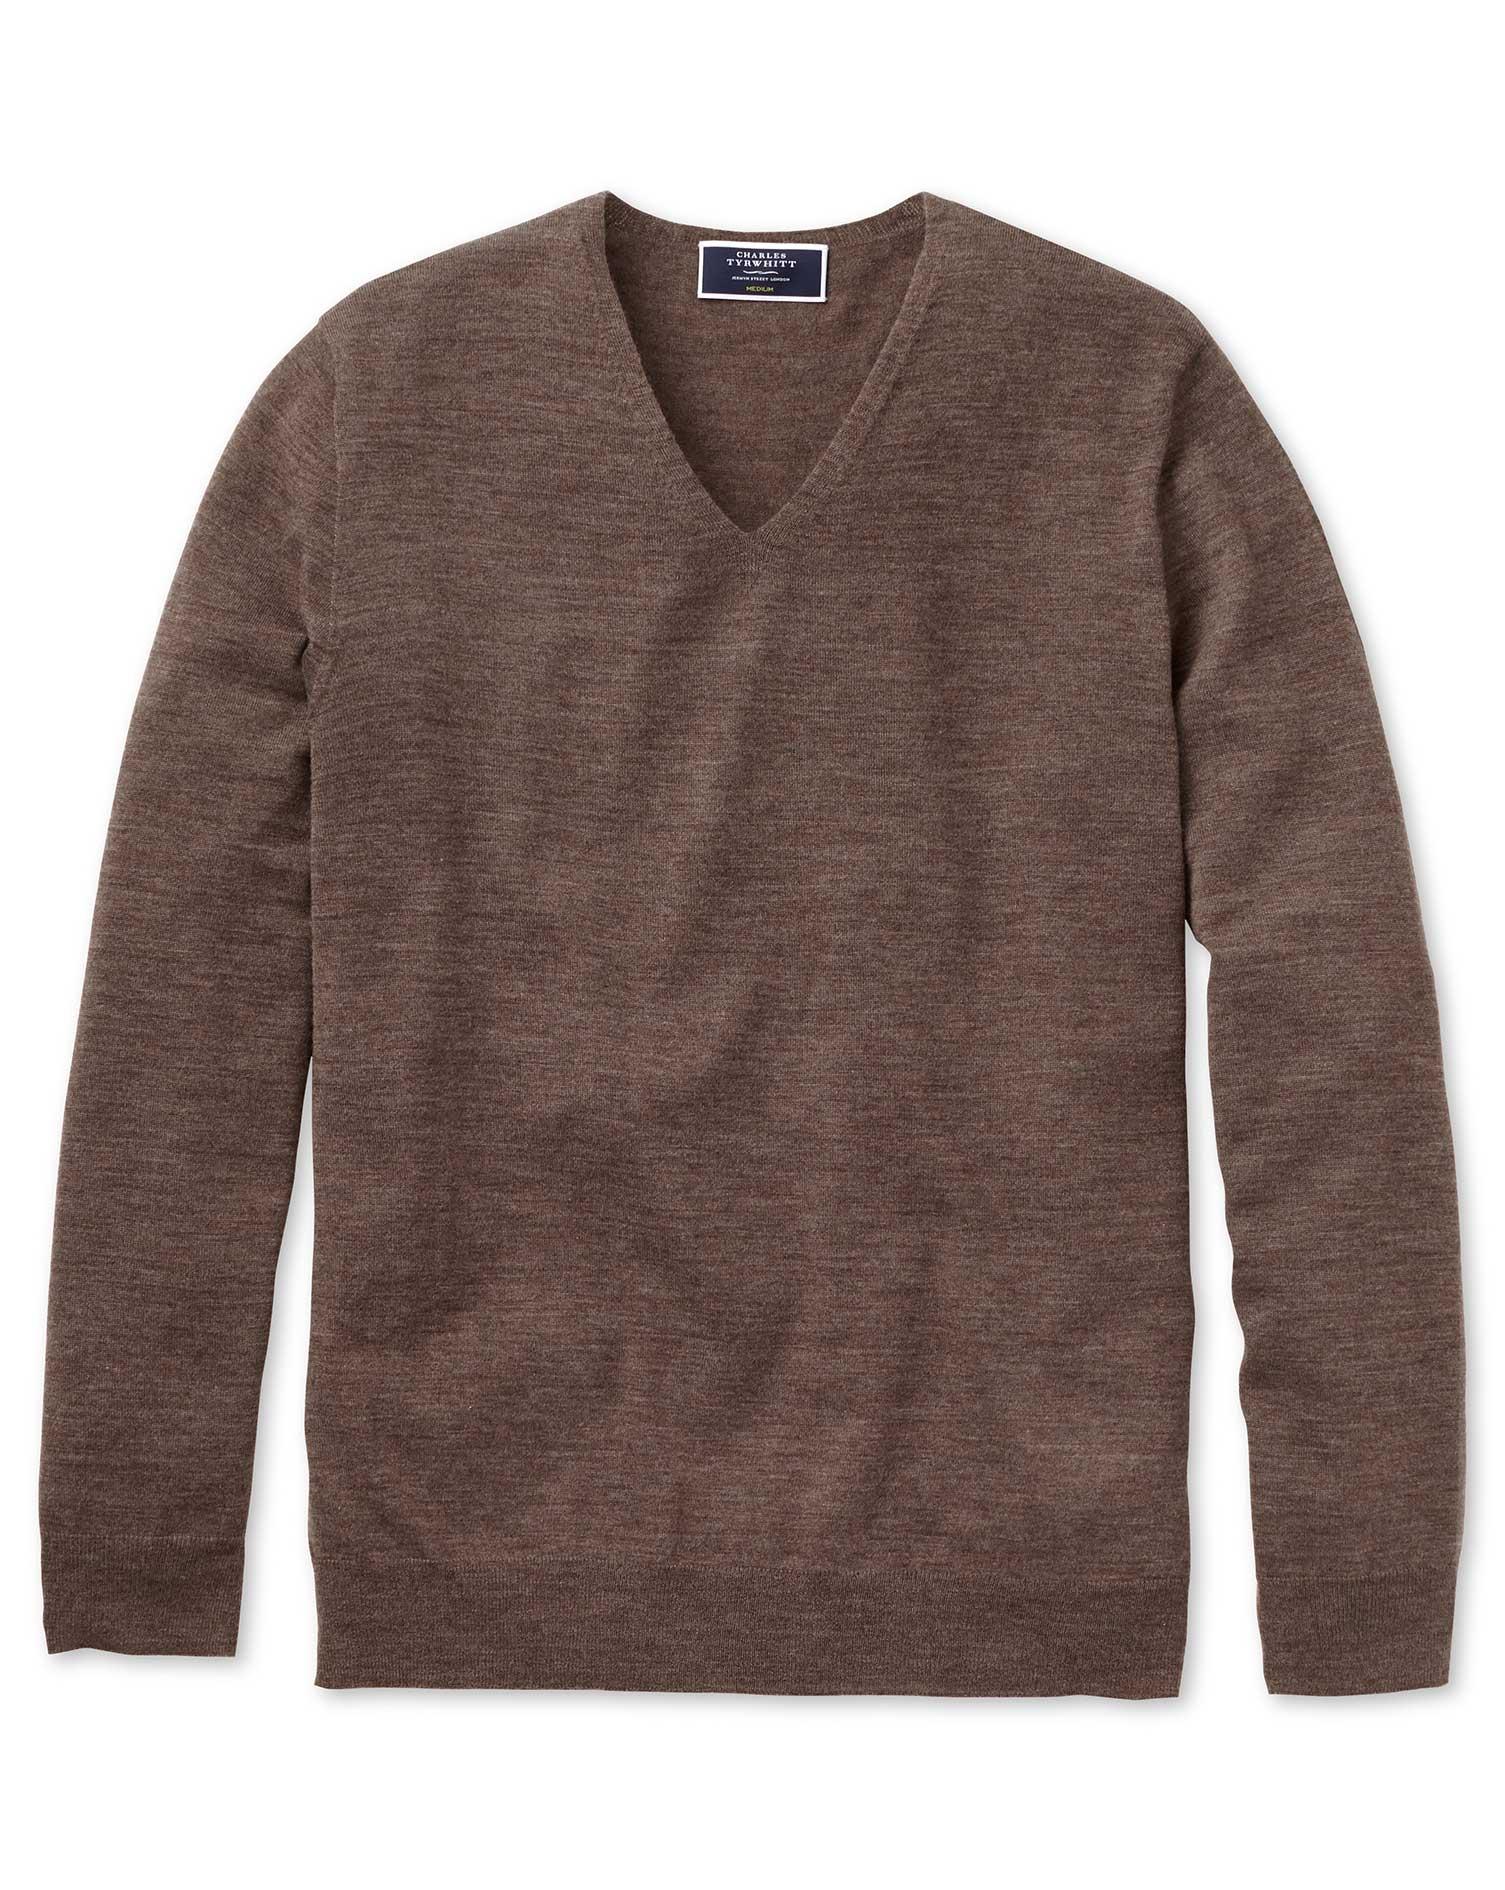 Brown Superfine Merino Seamless V-Neck Merino Wool Jumper Size Medium by Charles Tyrwhitt